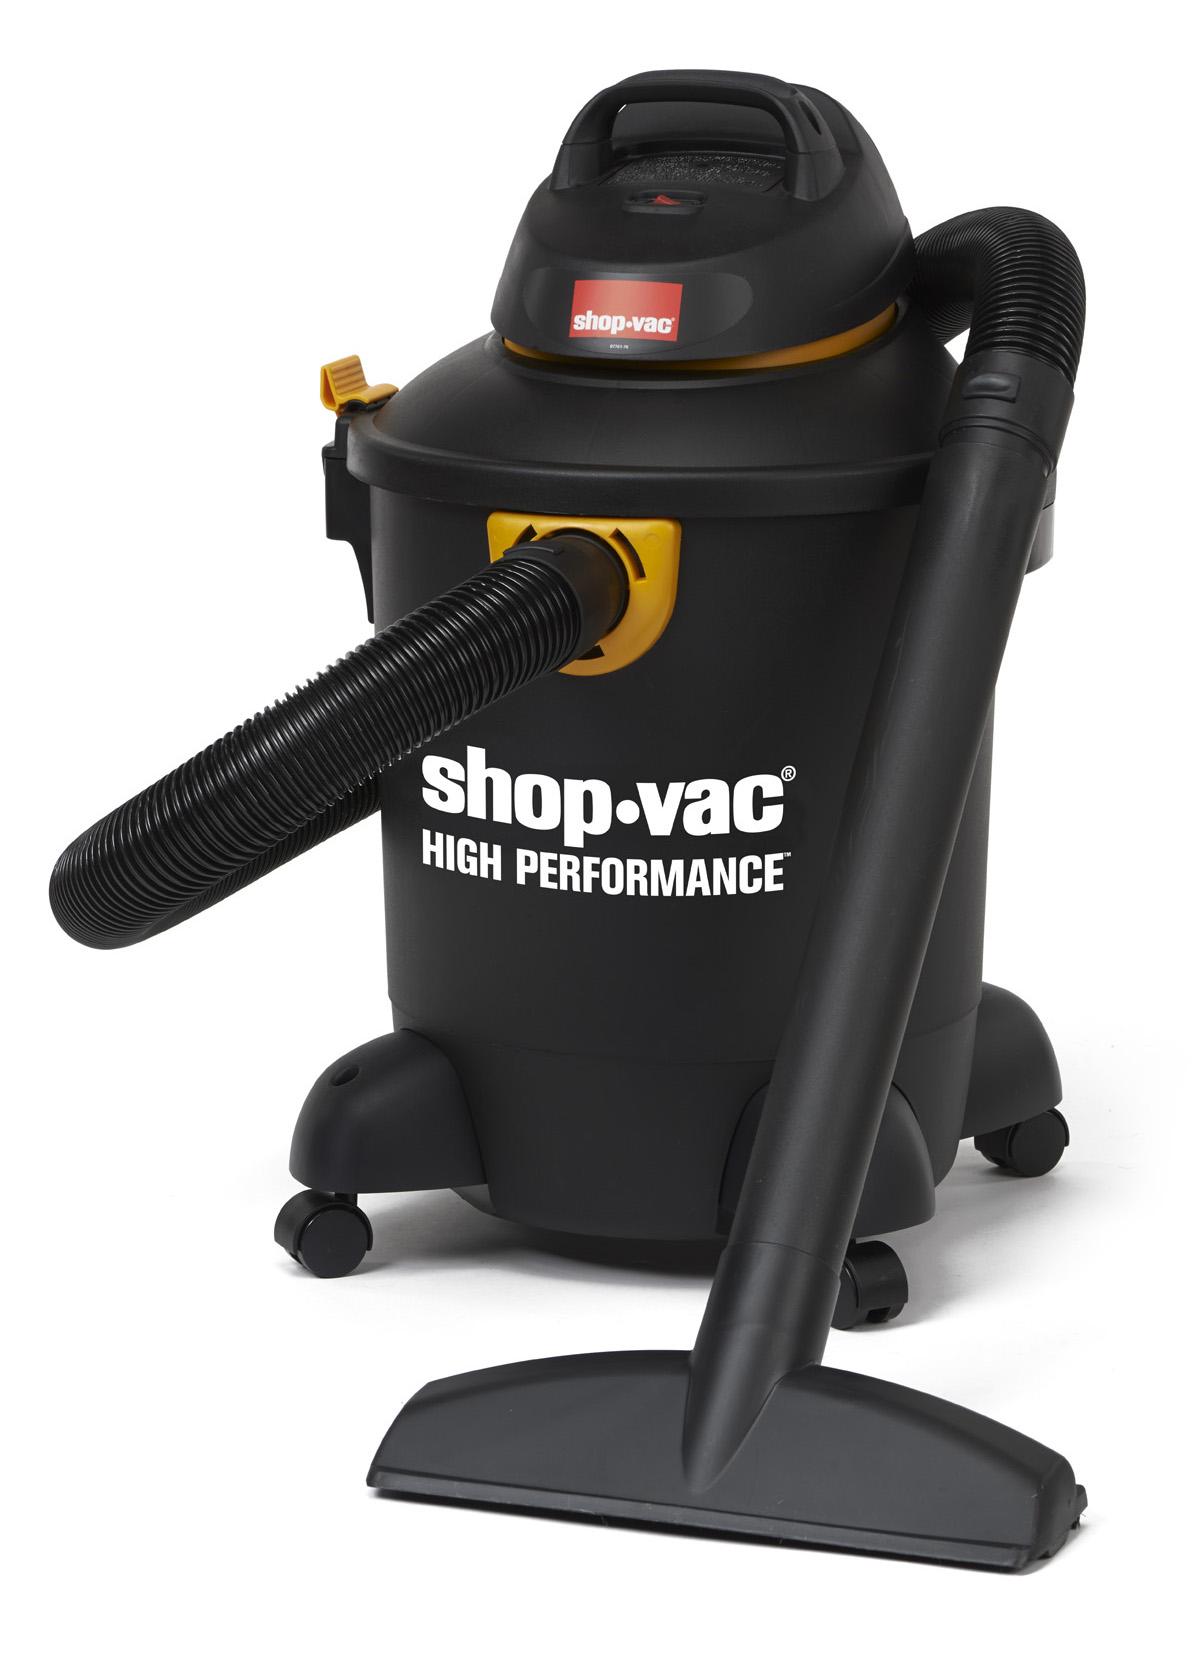 6 Gal 3.5 PHP vacuum